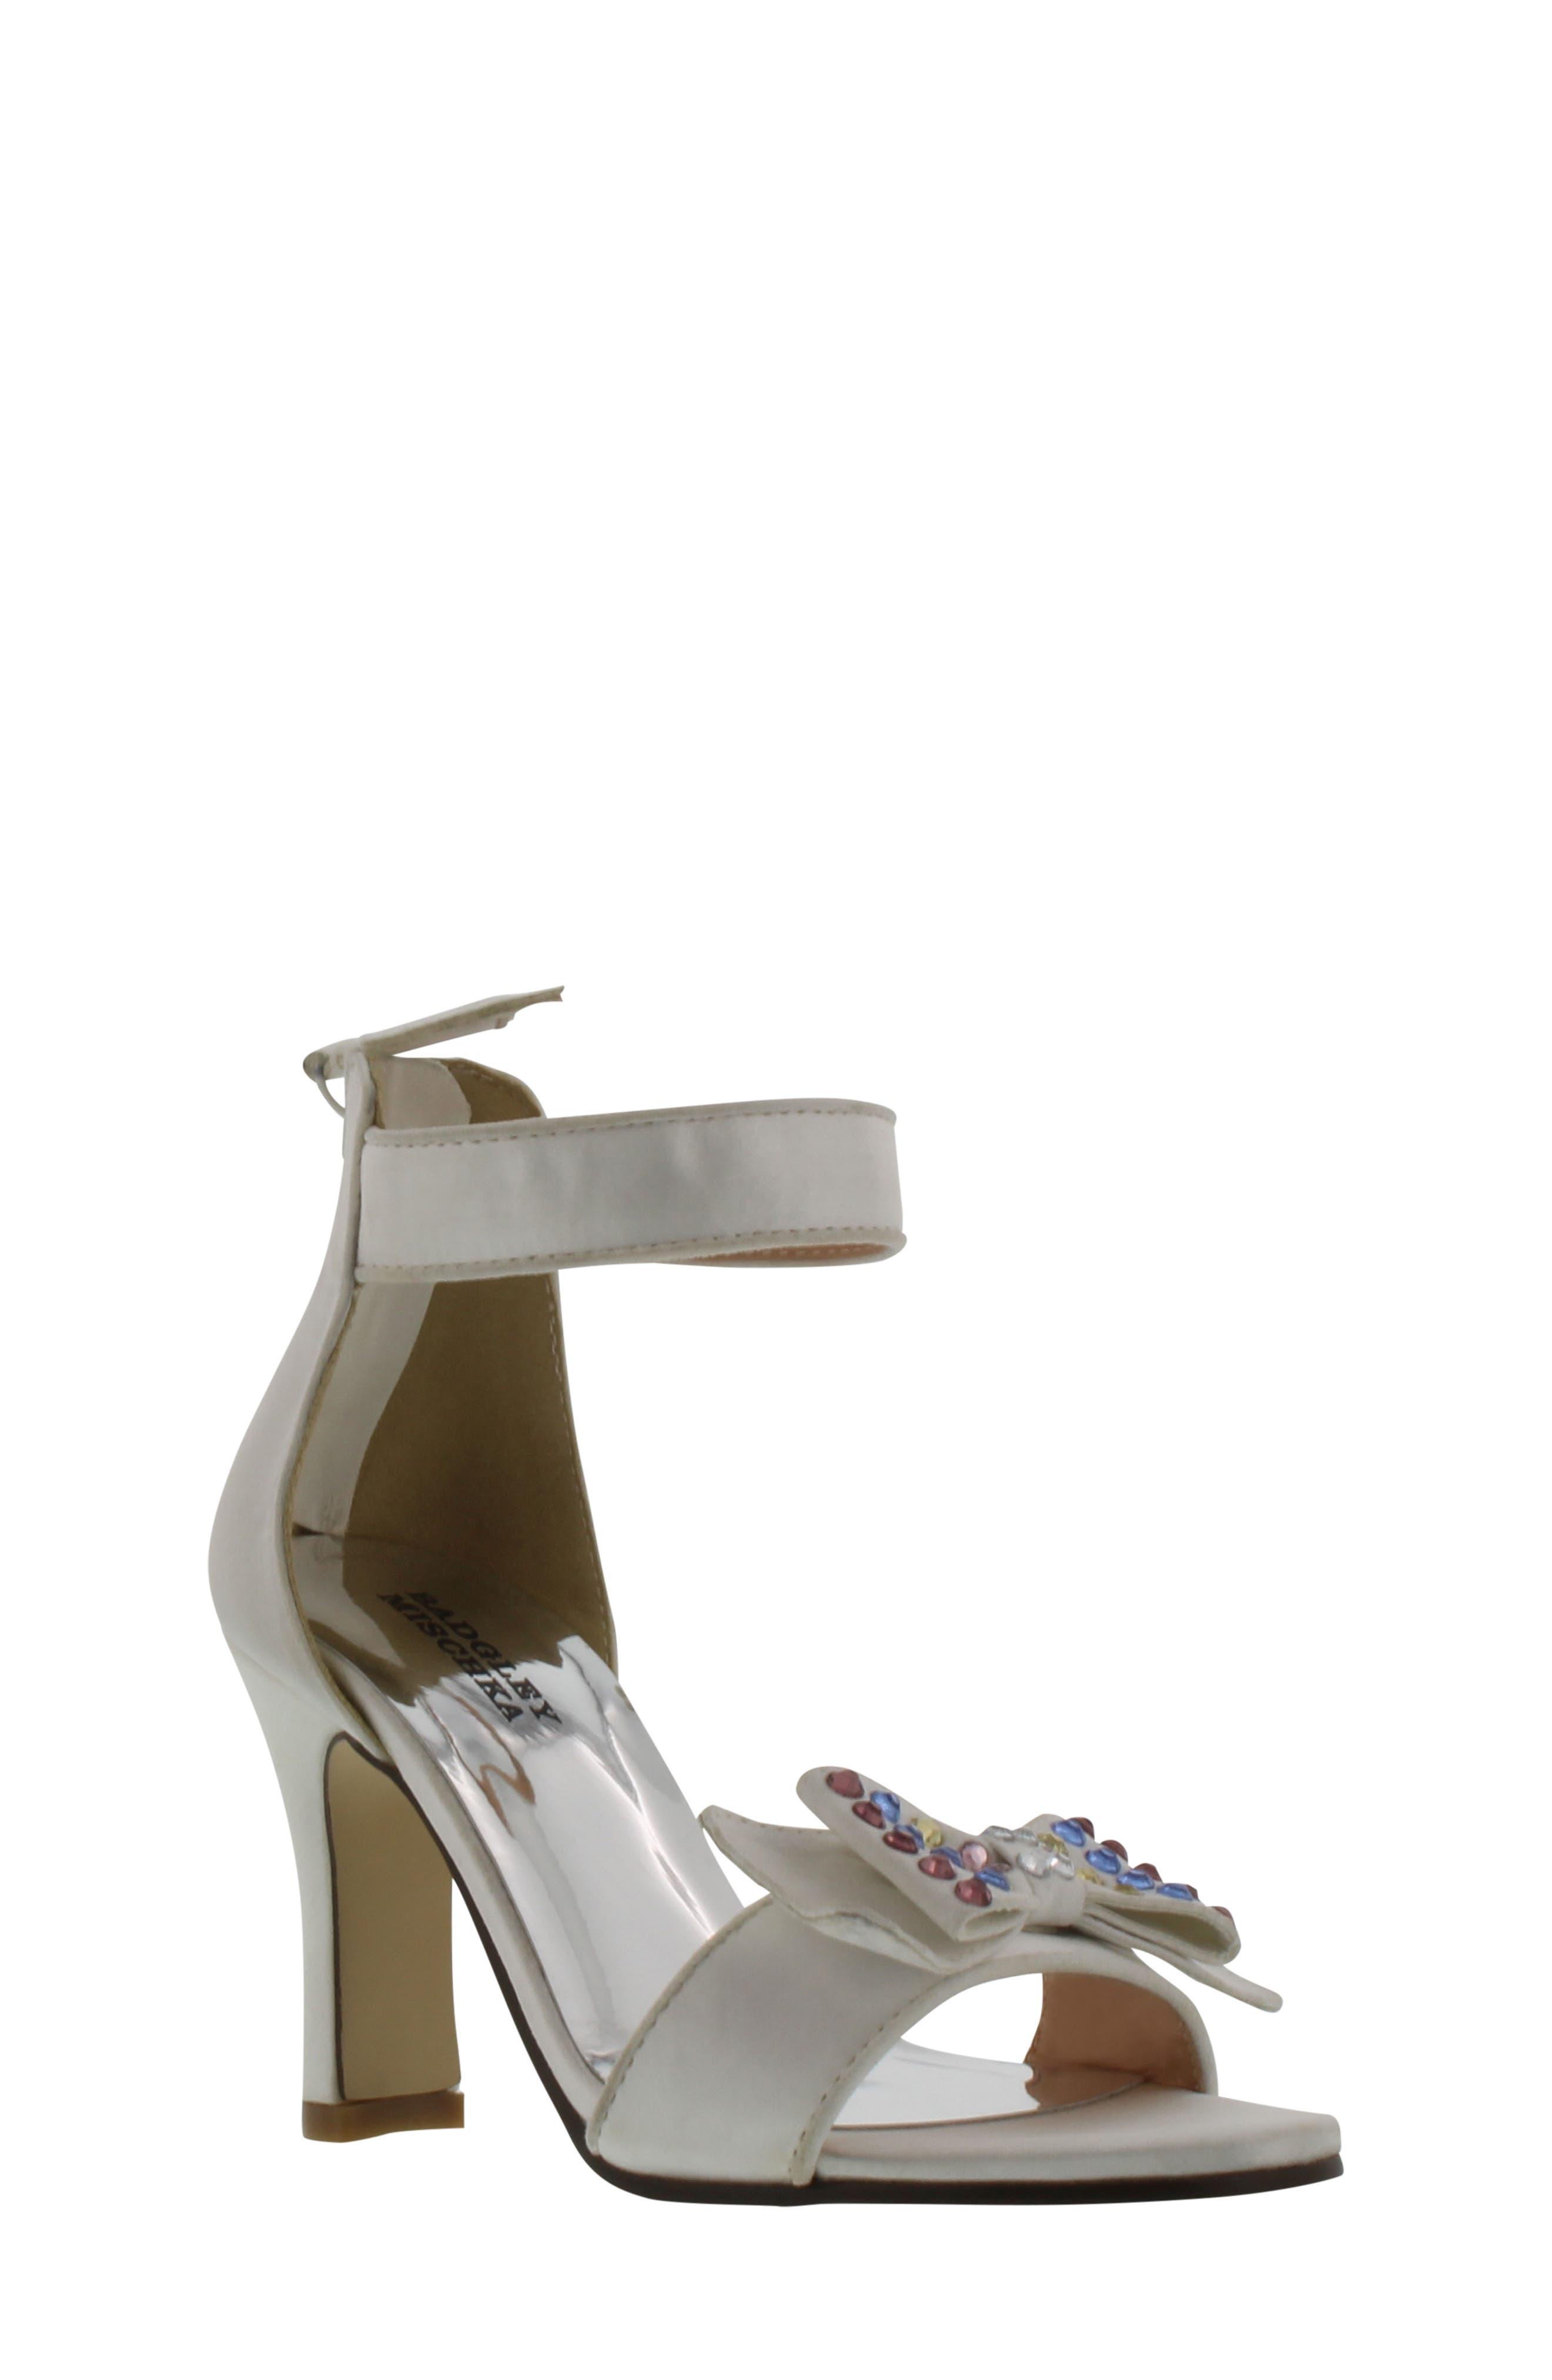 Kendall Embellished Bow Sandal,                             Main thumbnail 1, color,                             White Multi